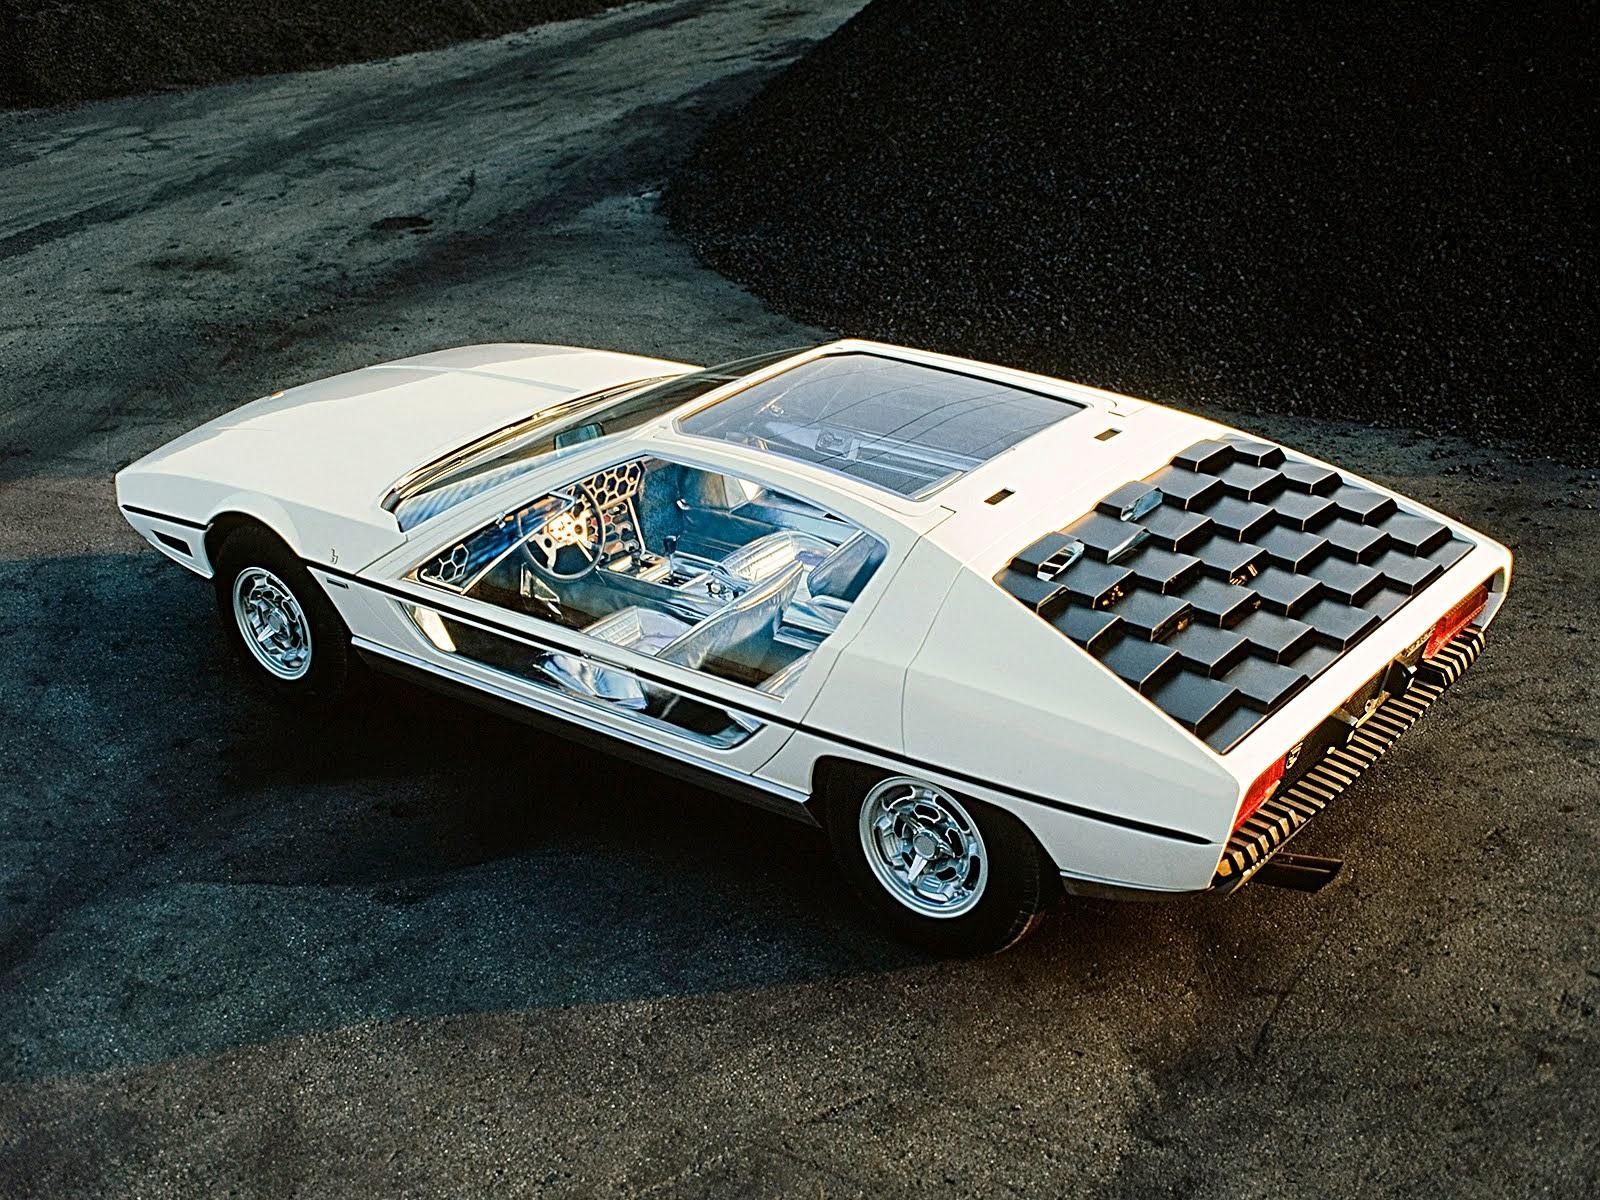 lamborghini-marzal-rear%2Bthree%2Bquarter Remarkable Ferrari Mondial Rear Window Motor Cars Trend